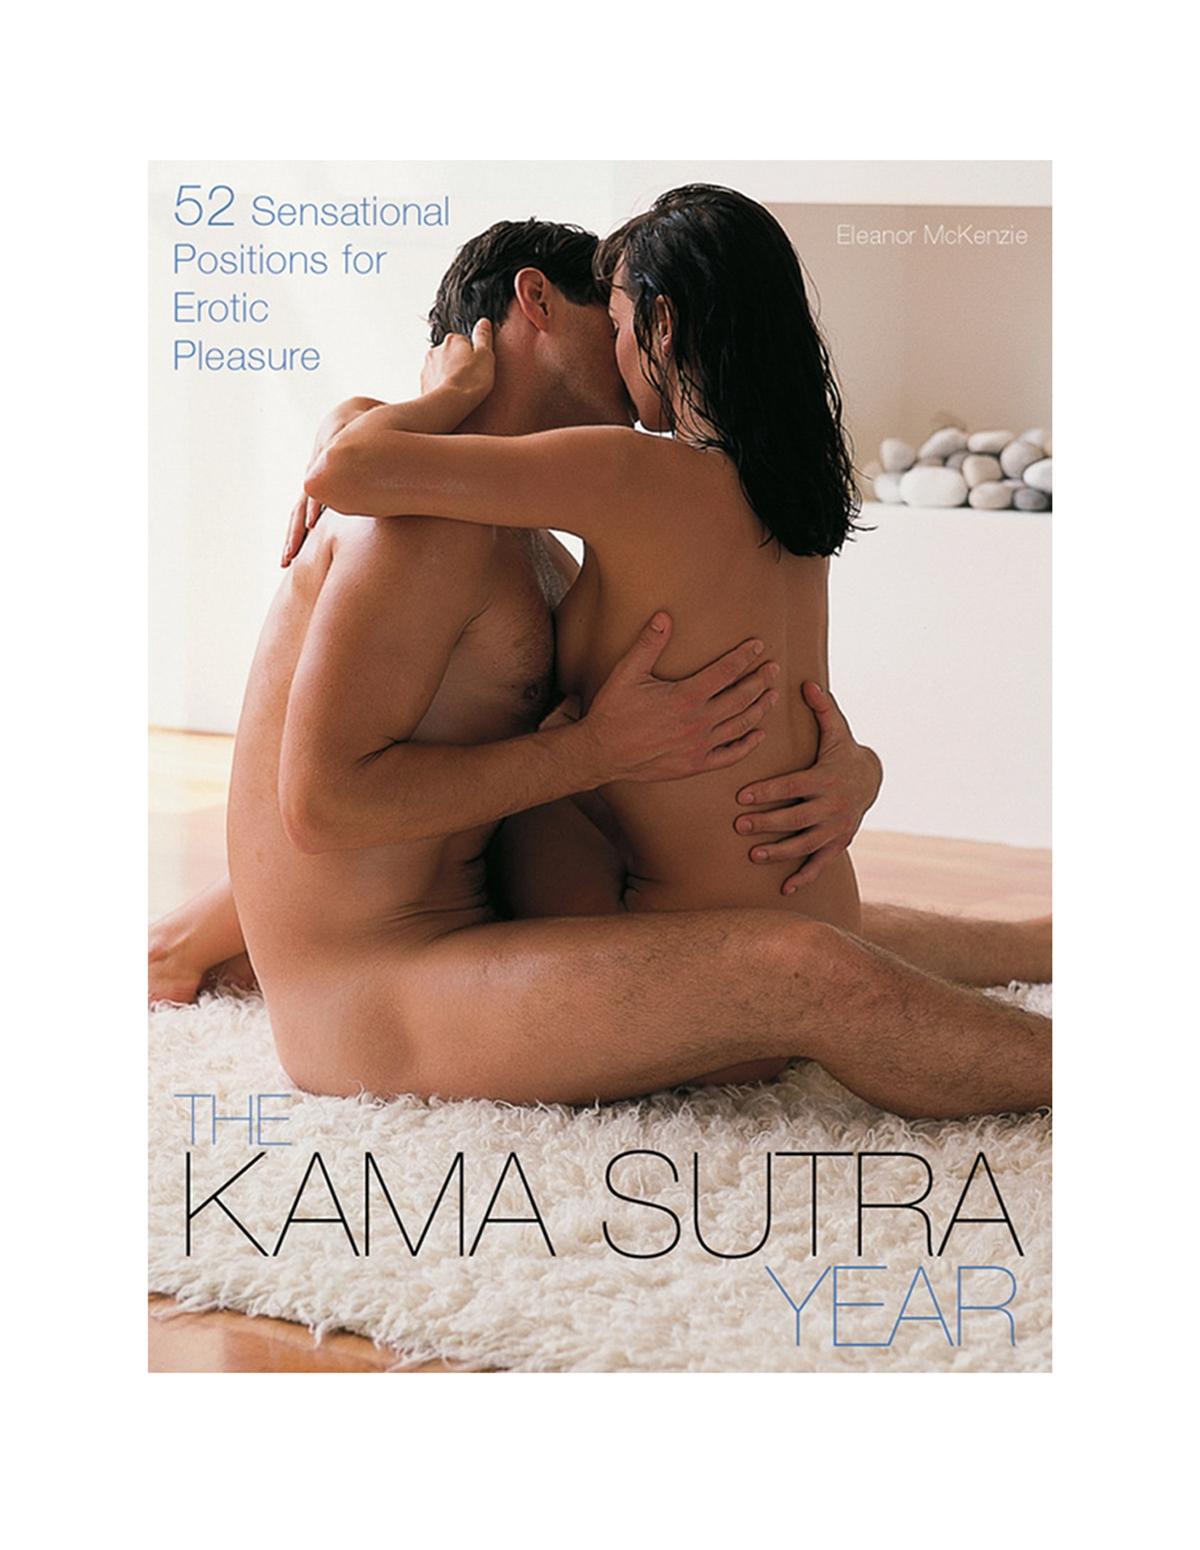 Kama Sutra Year Book